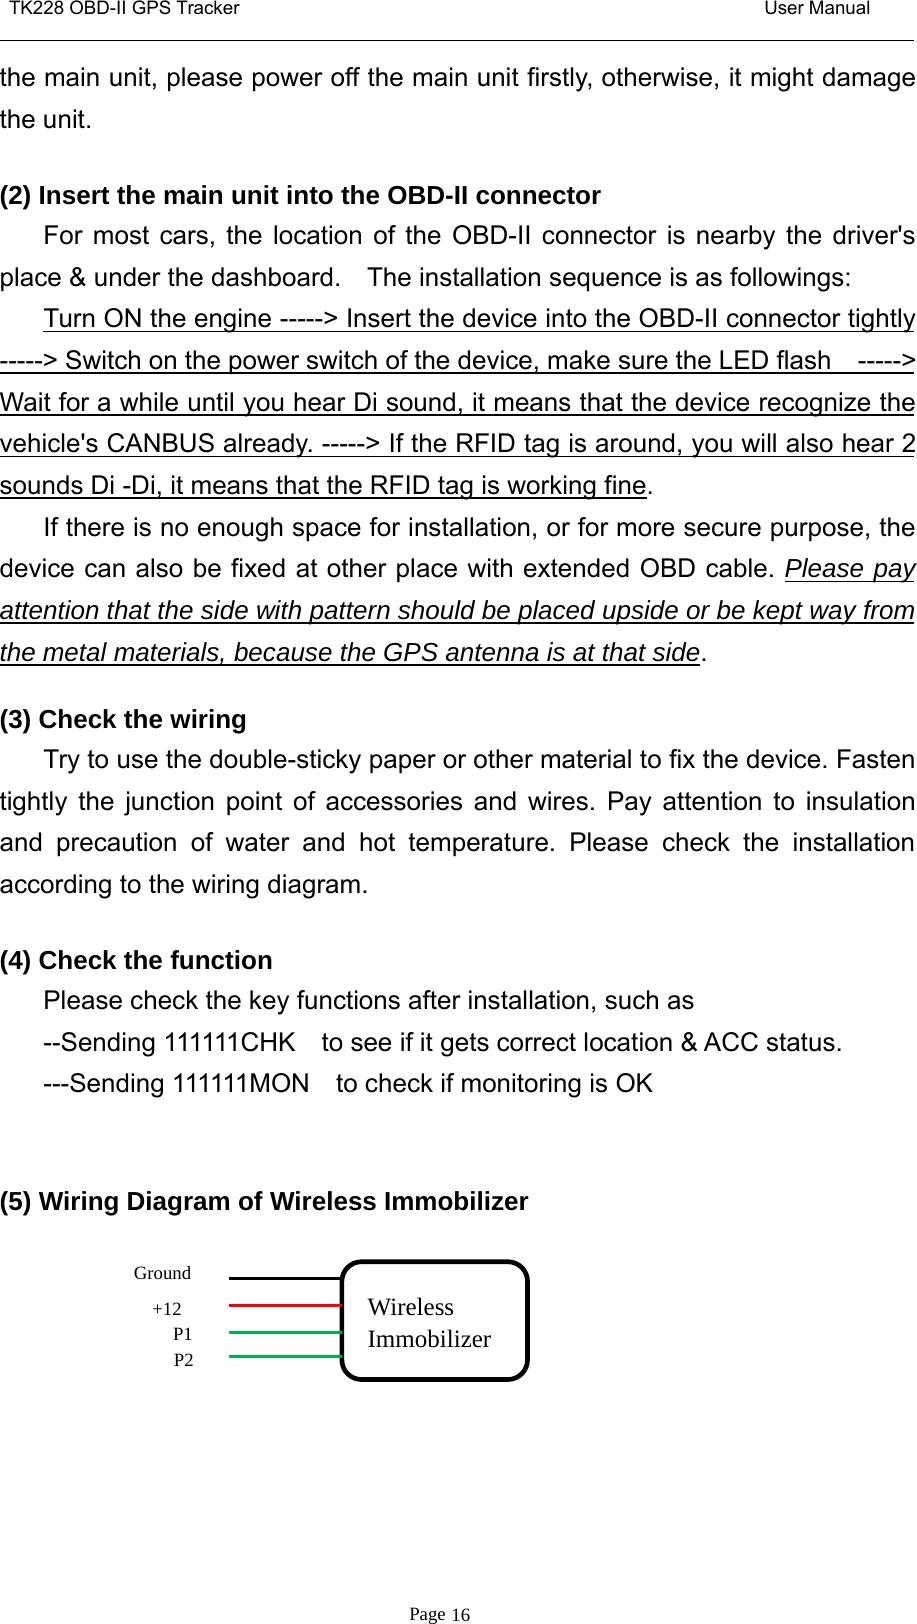 50 3 Way Switch Wiring Diagram Pdf Hi6h Di 2020 Manual Guide